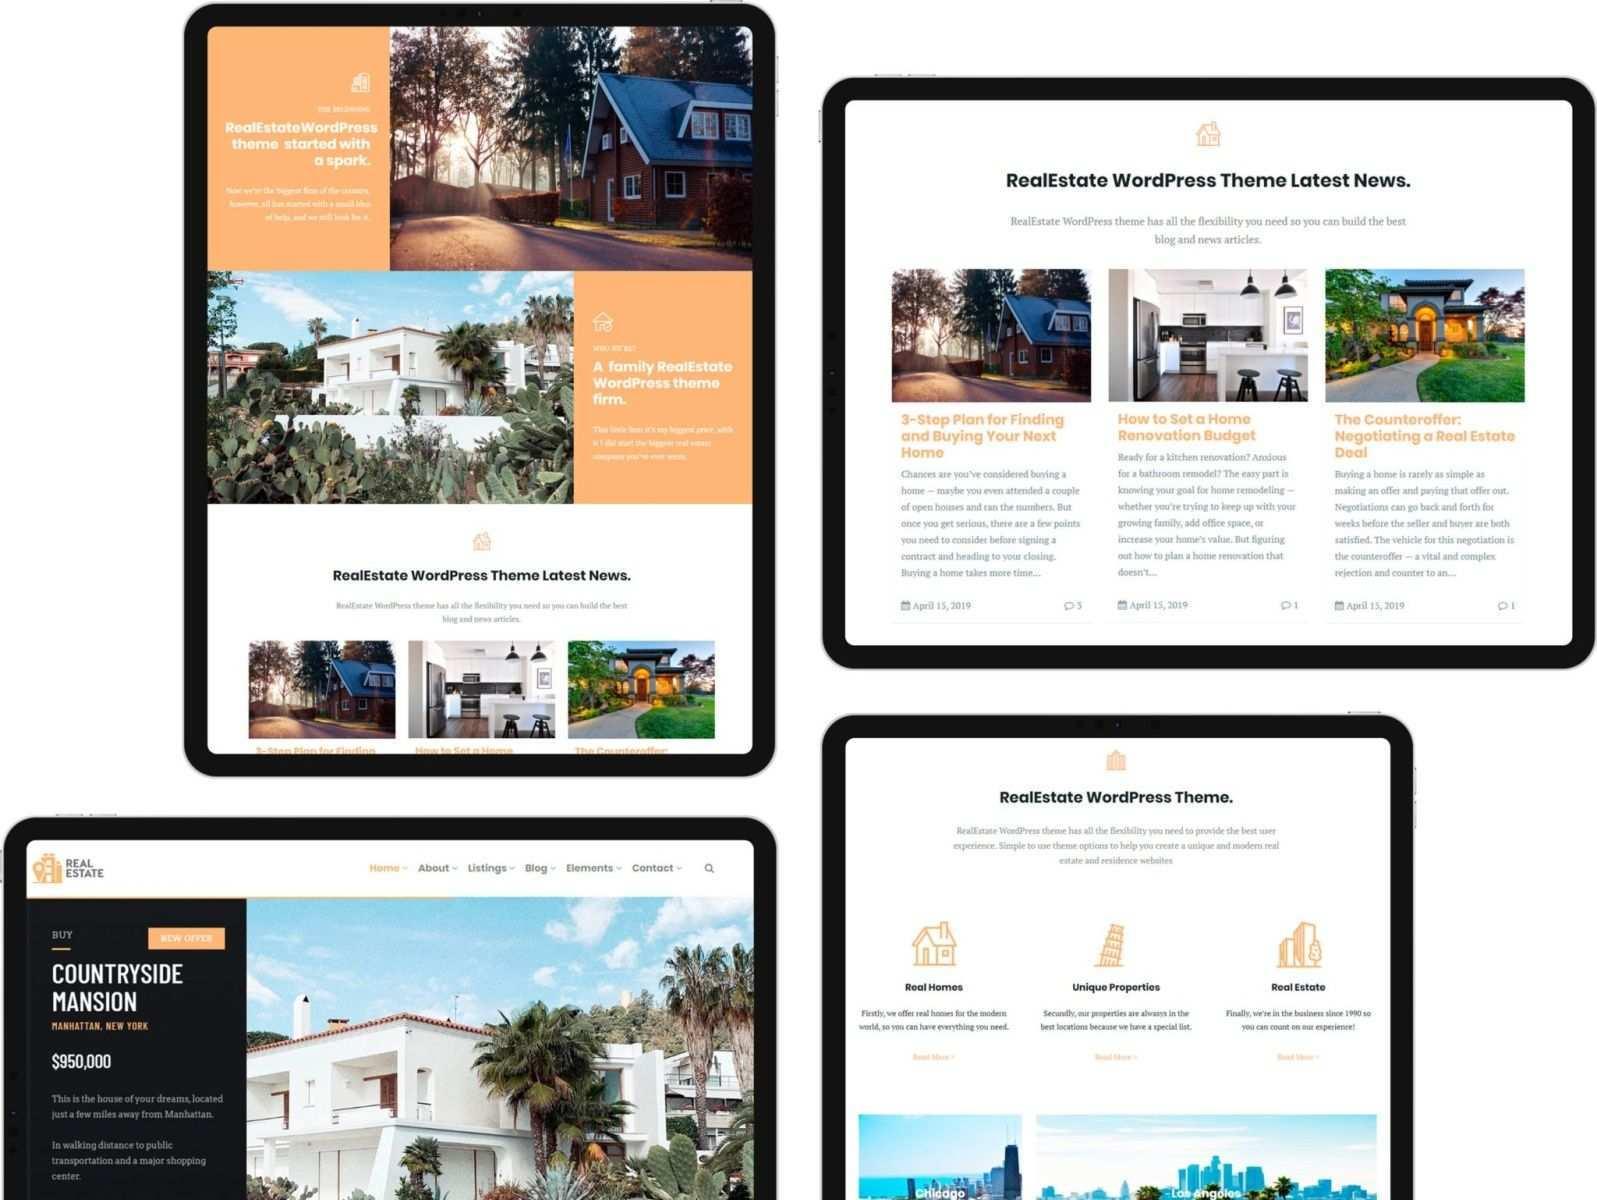 Tabled View Realestate Wordpress Theme Em 2020